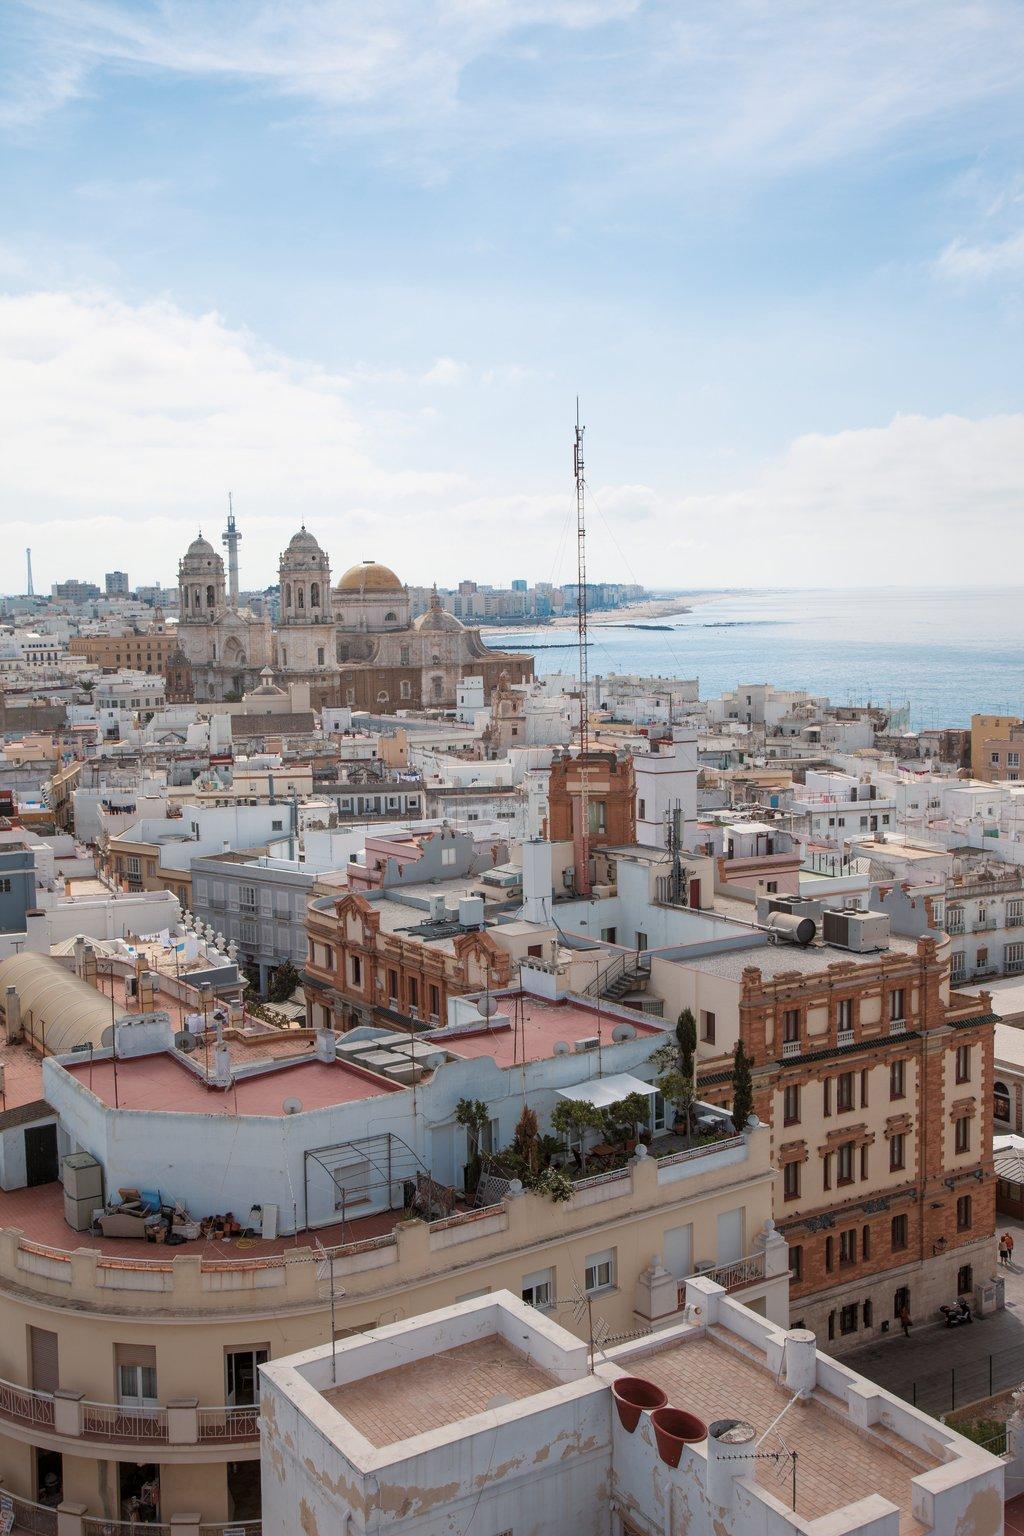 Ausblik aus dem Turm Torre Tavira in Cádiz